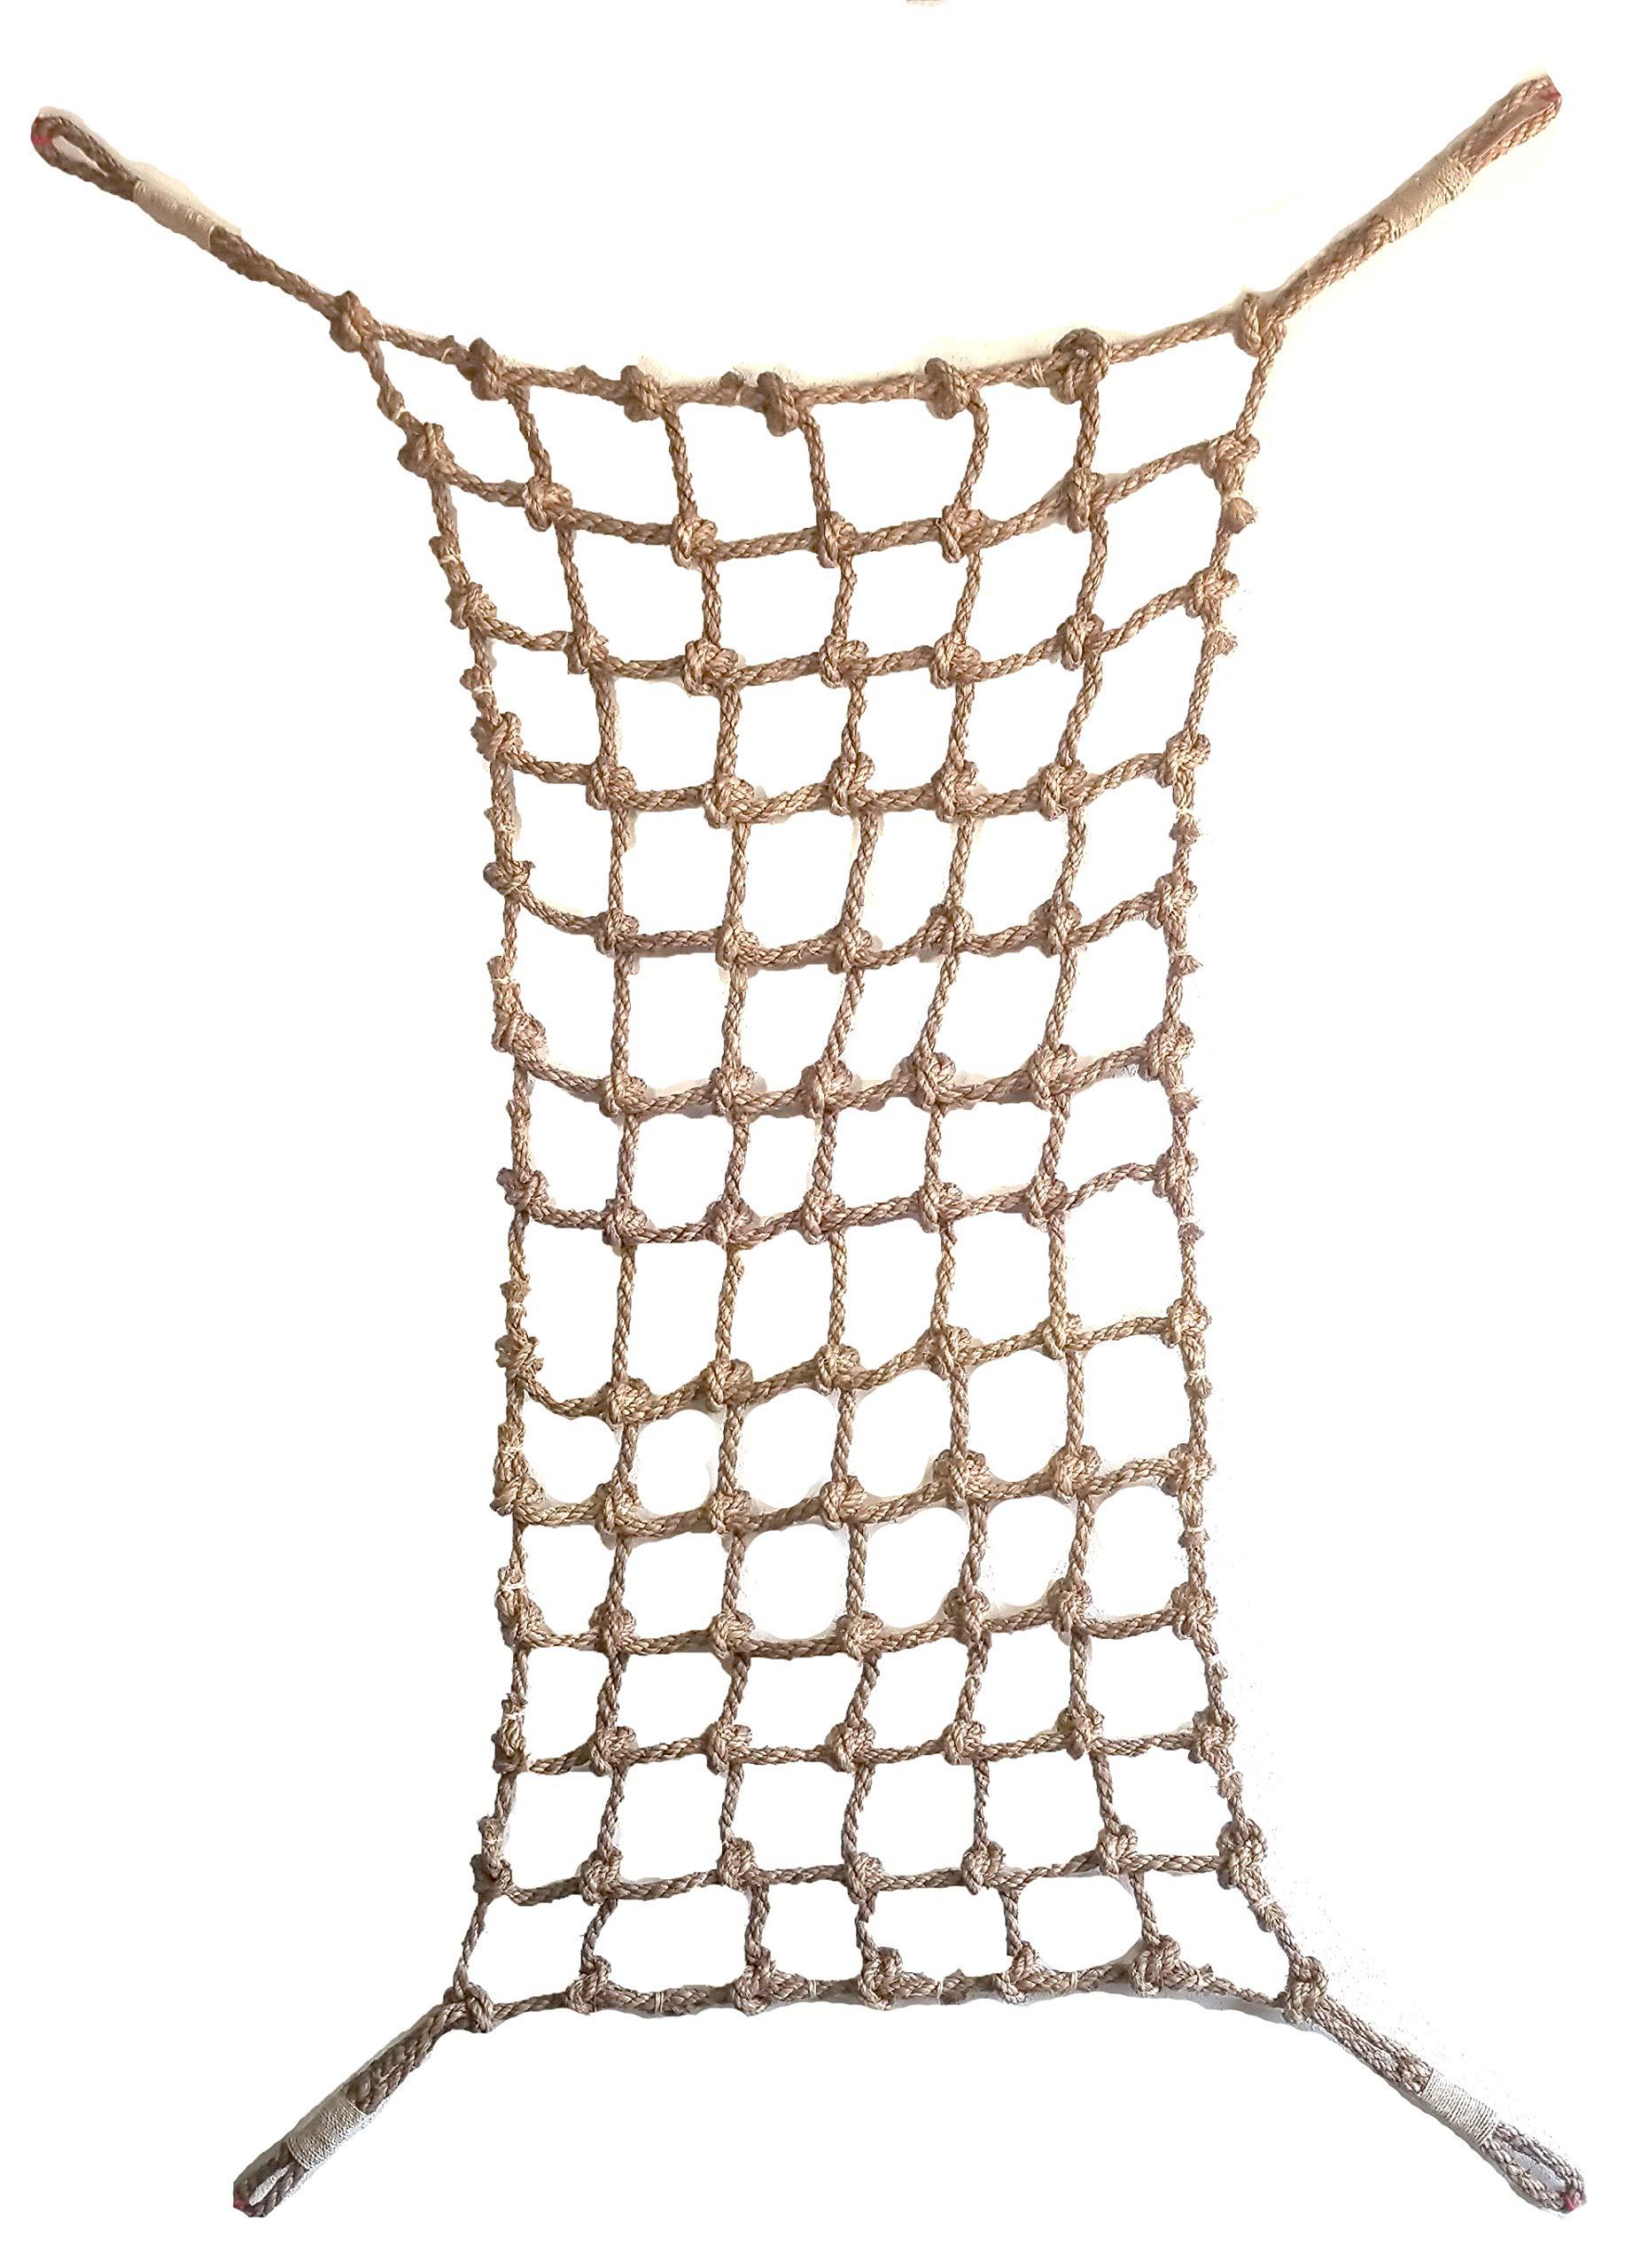 ARONICO Canopy Bird Net Play Gym (Large) by ARONICO